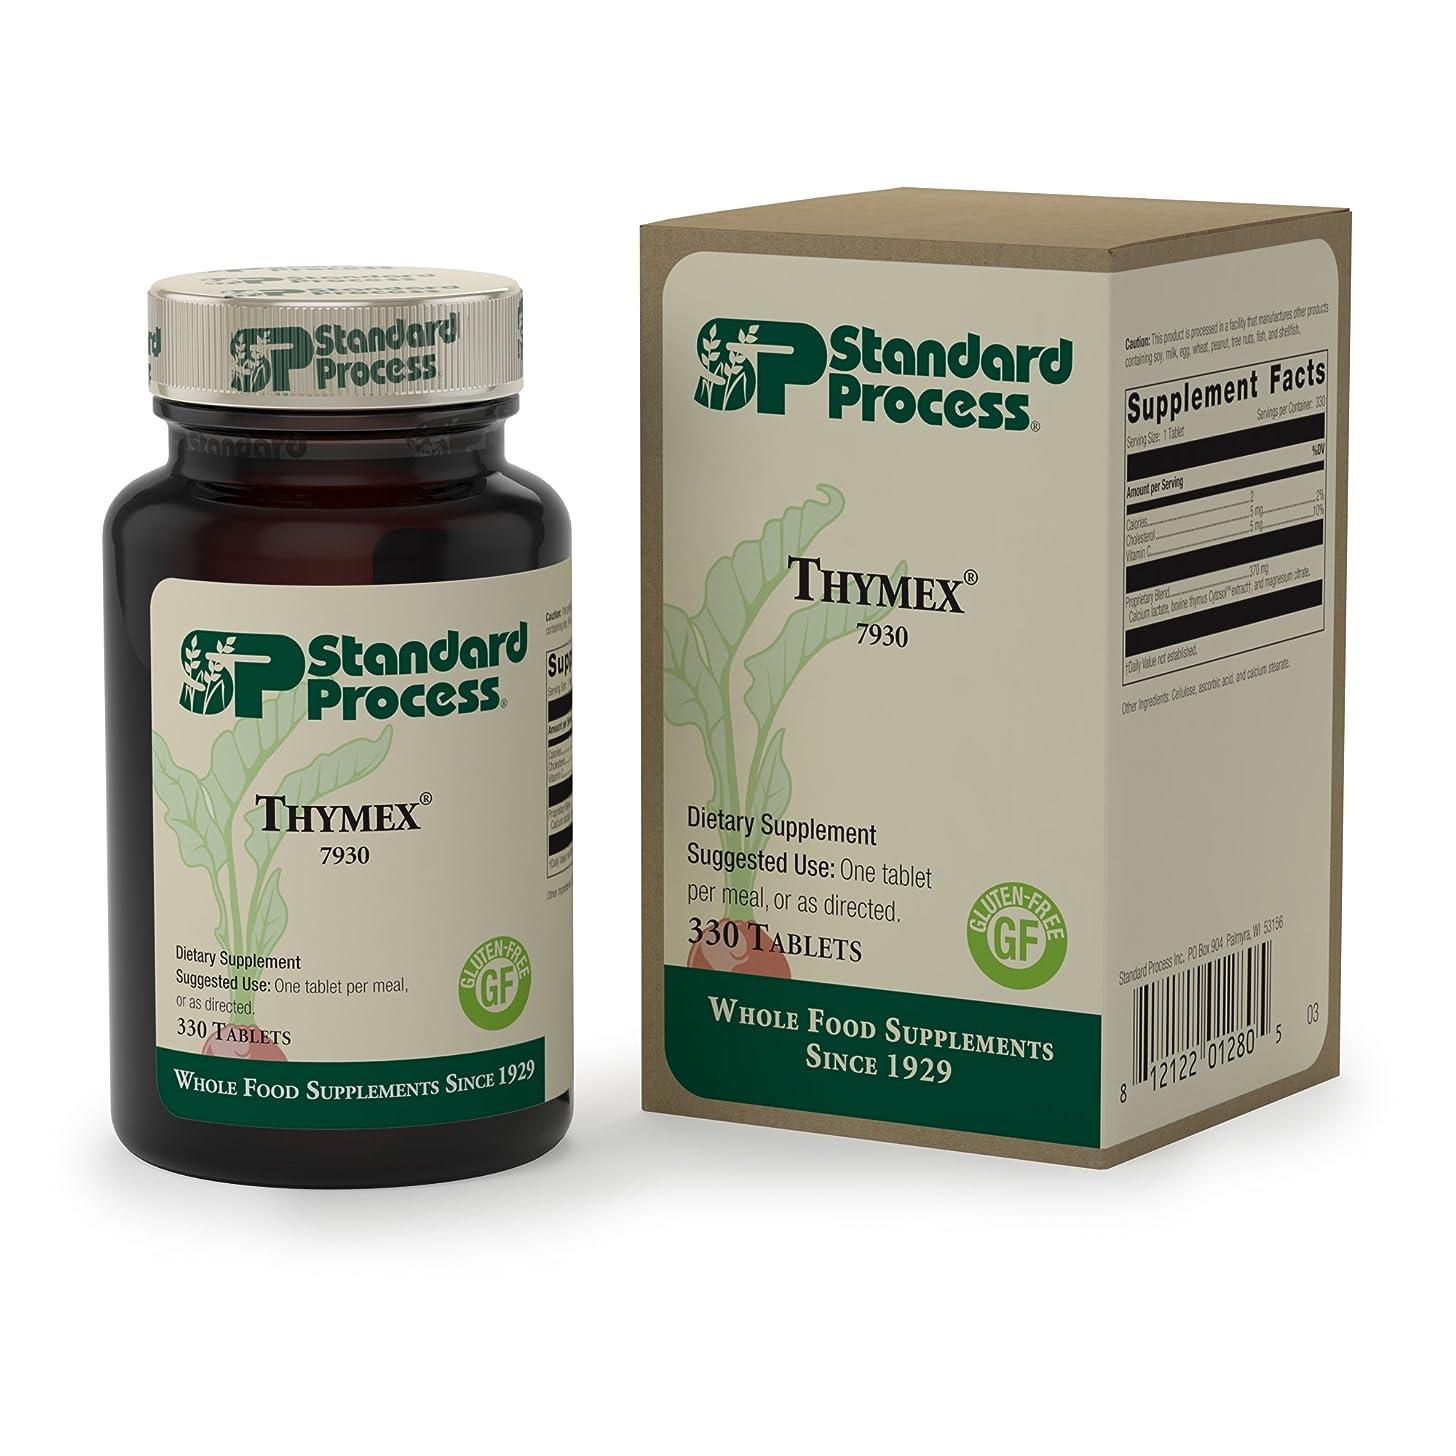 Standard Process - Thymex - Thymus Gland Support Supplement, Supports Immune System Health, Provides Antioxidant Vitamin C, Gluten Free - 330 Tablets